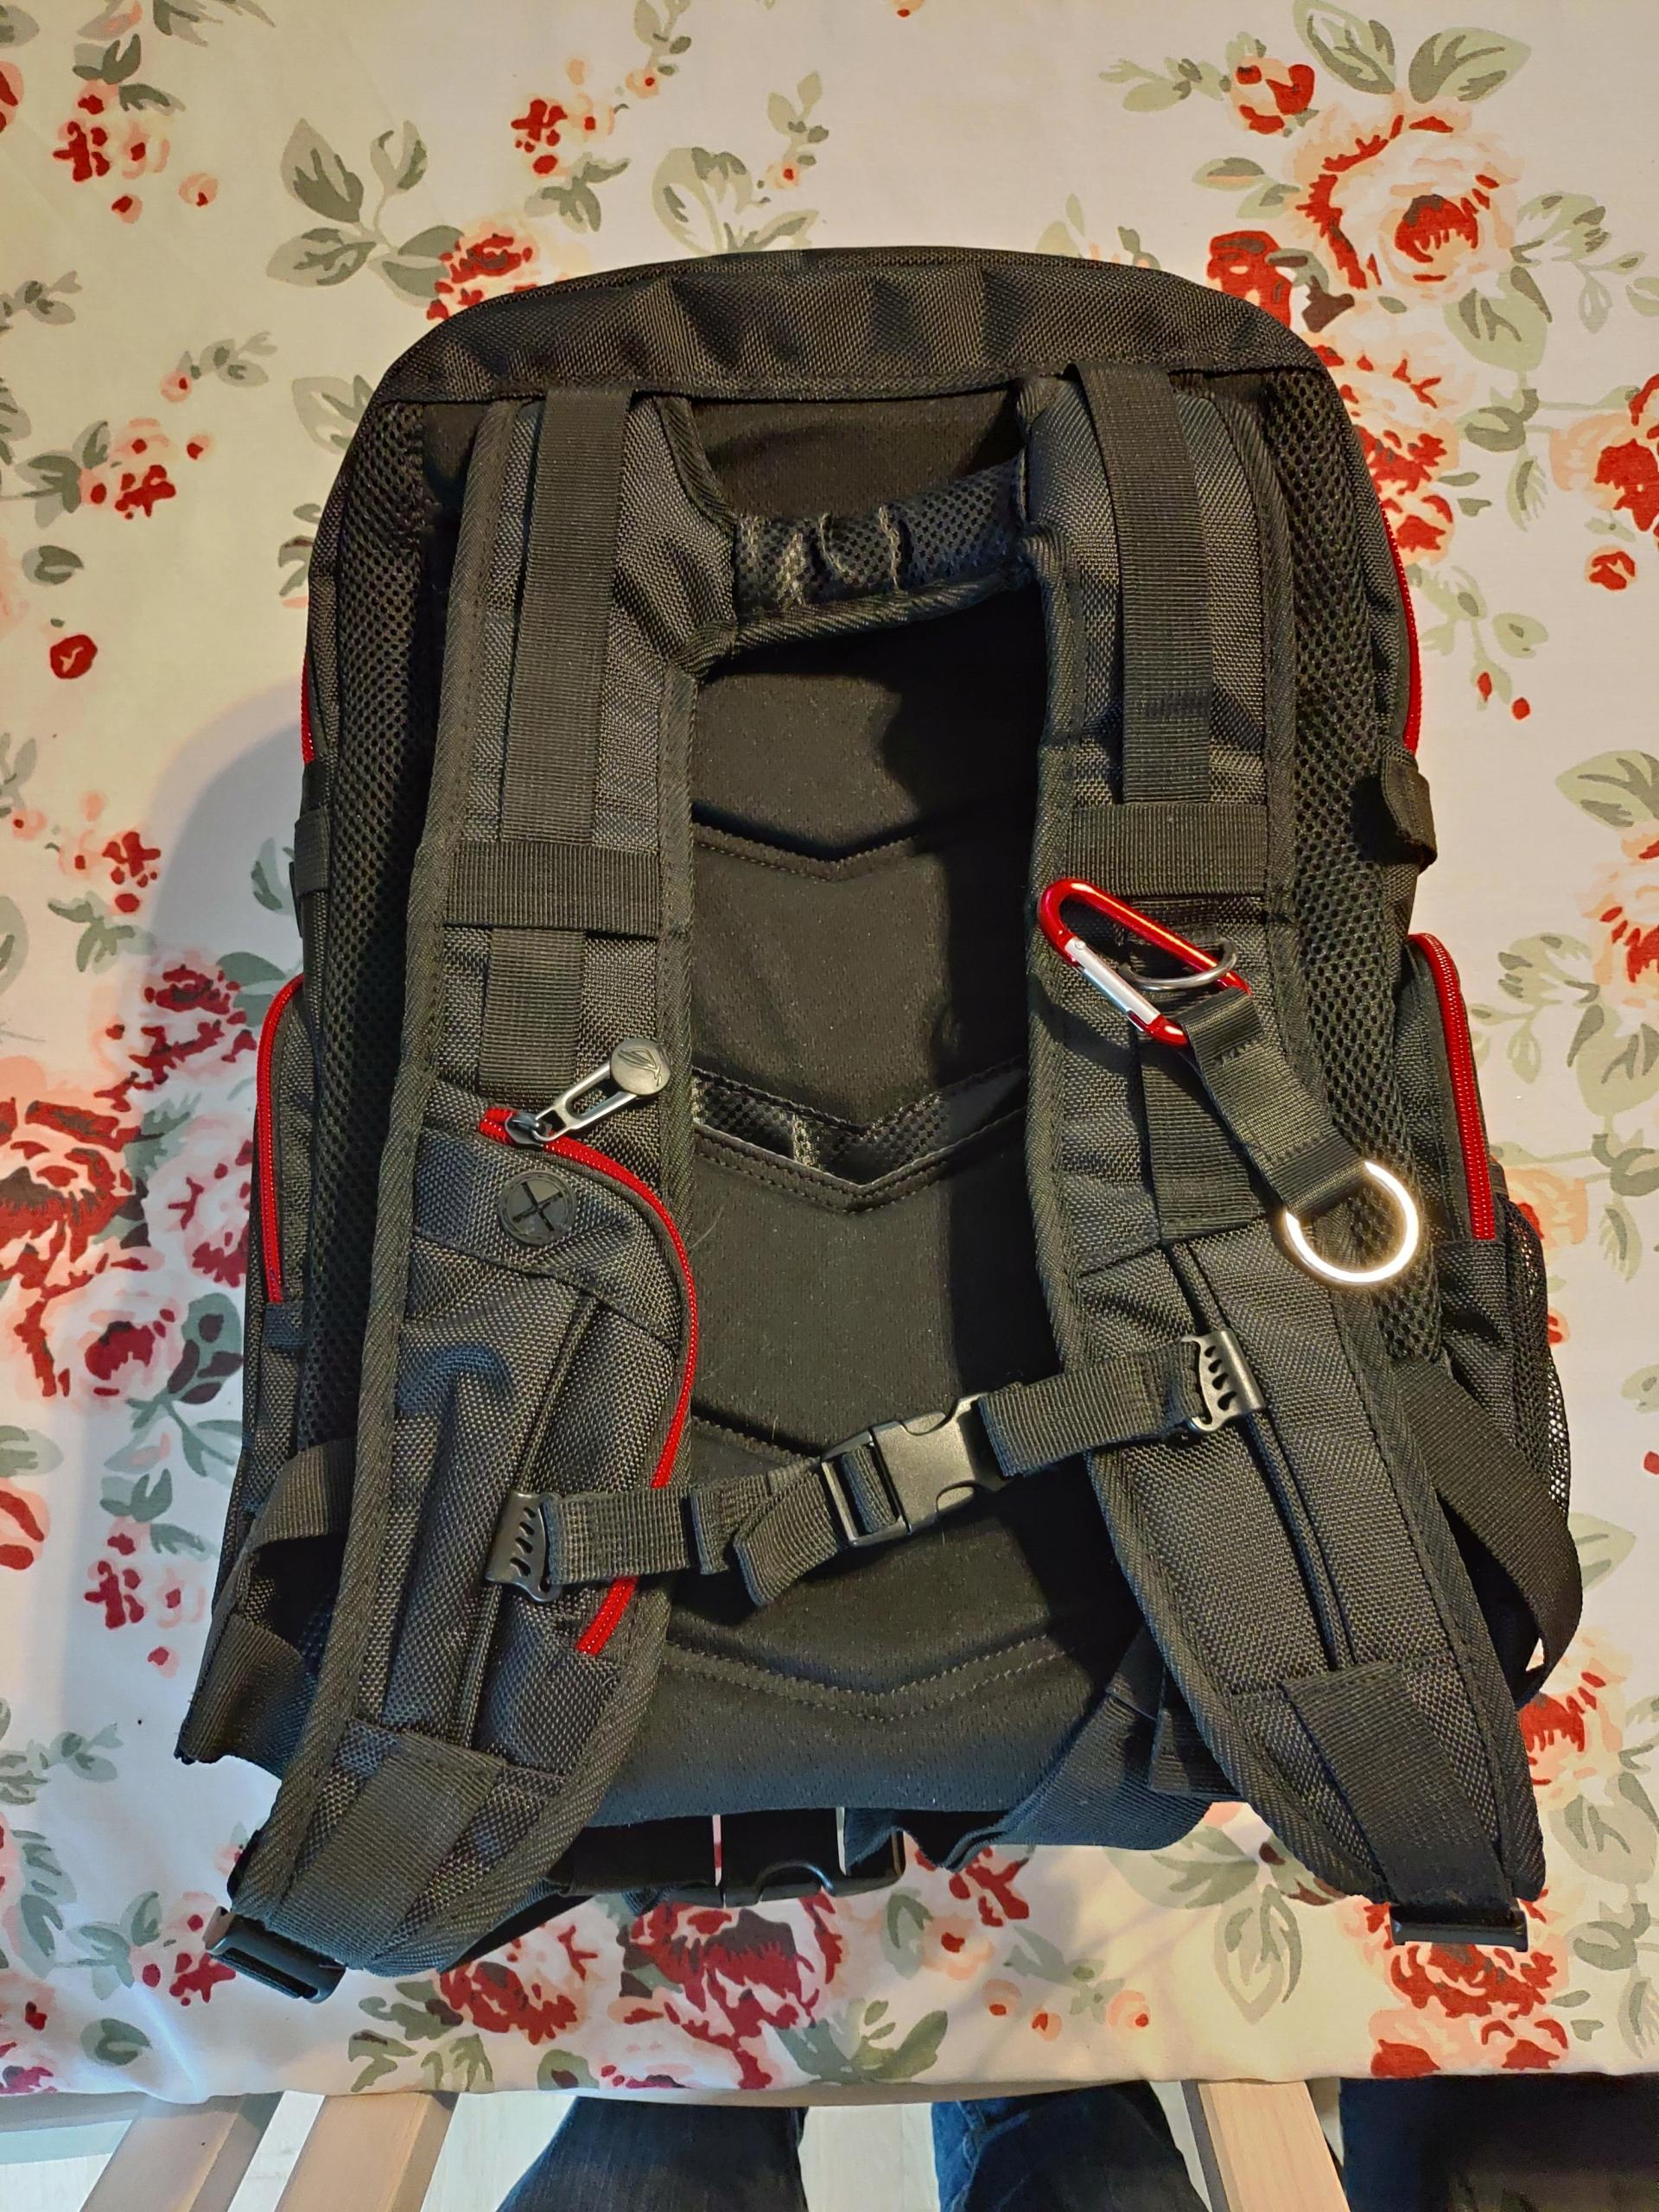 2137378699bef ASUS ROG Nomad - Plecak Laptop 17.3 cala - 7704766986 - oficjalne ...